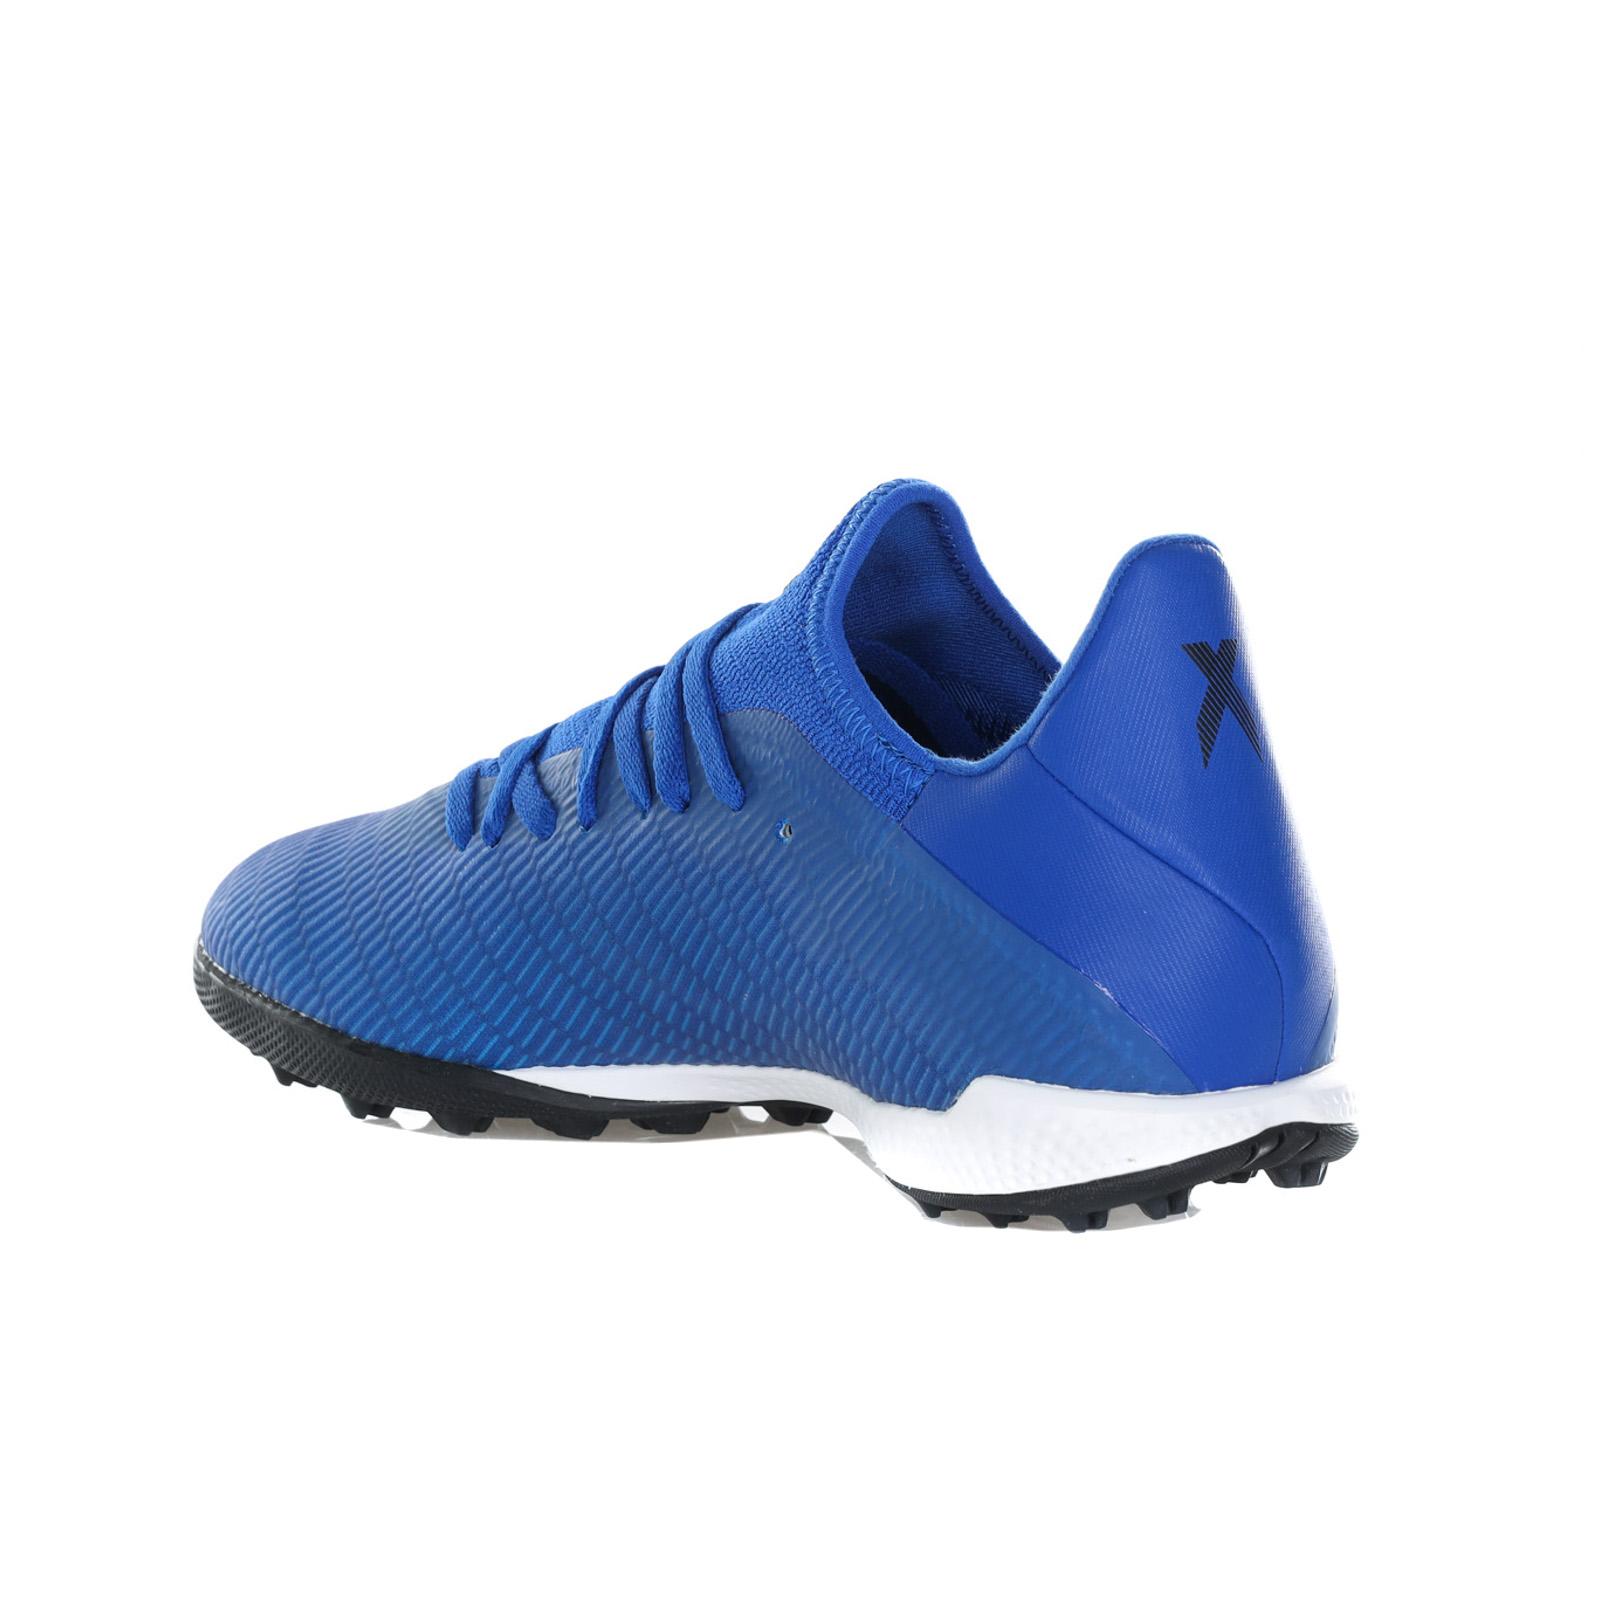 ADIDAS | Football boot | EG7155ROYBLU/FTWWHT